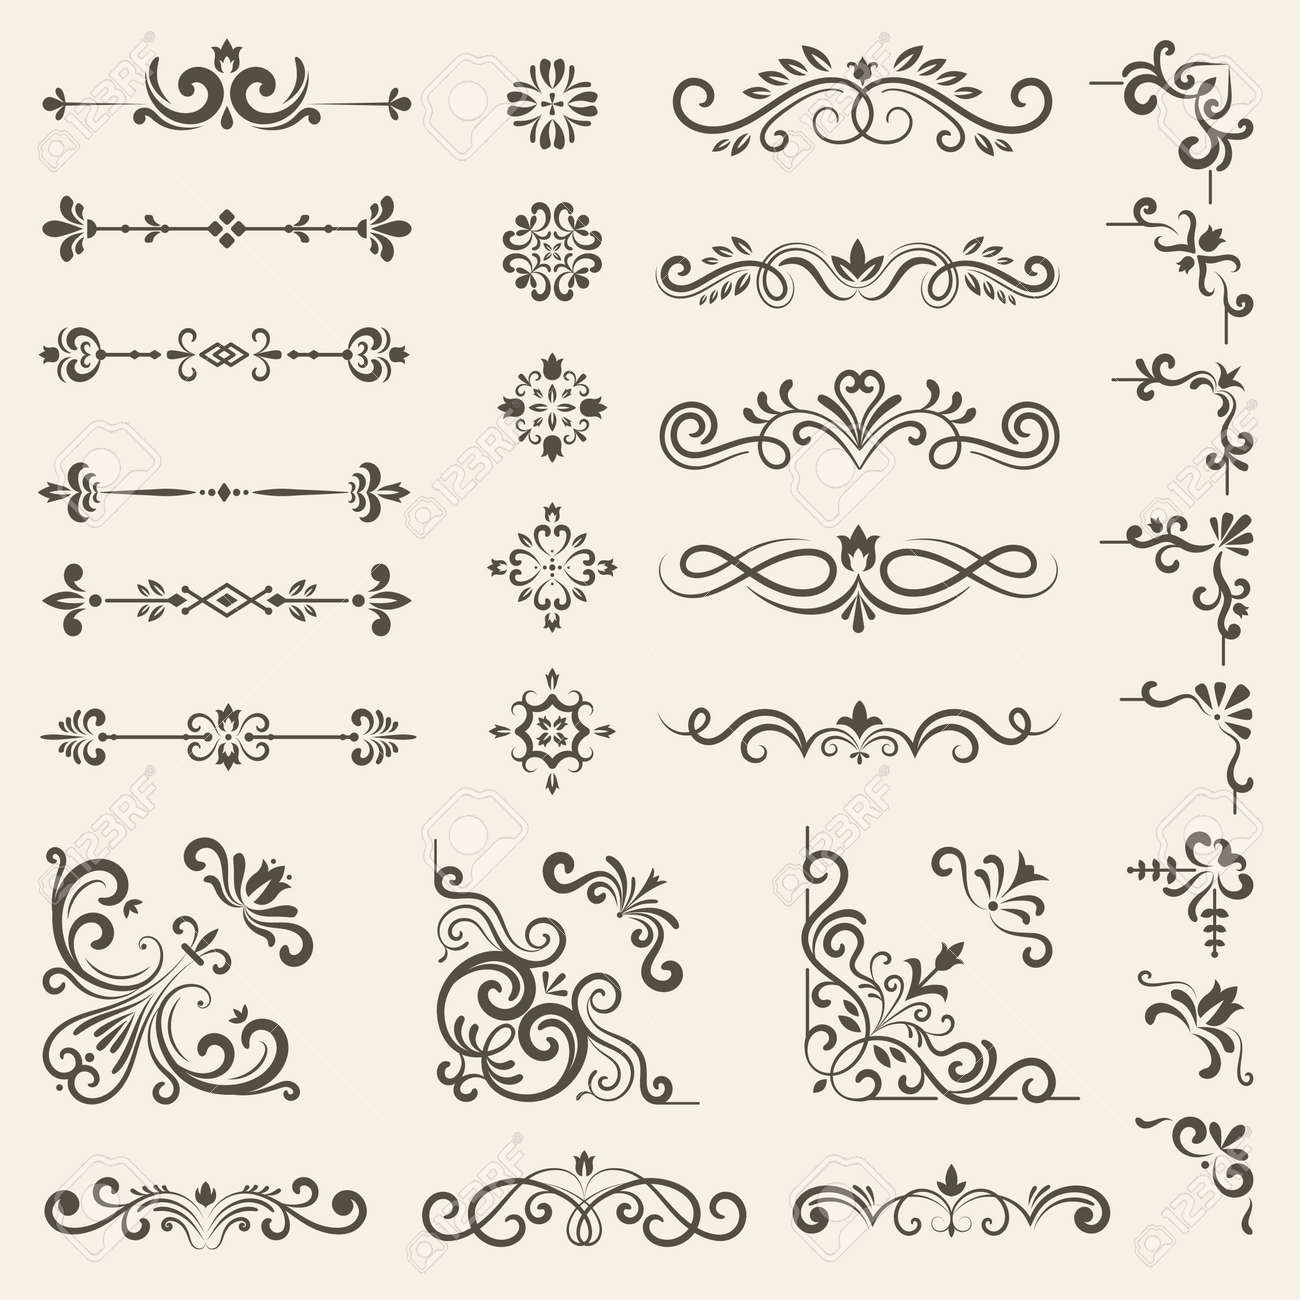 Decorative ornate set. Vintage floral dividers and borders royal premium style decoration vector set - 167403182